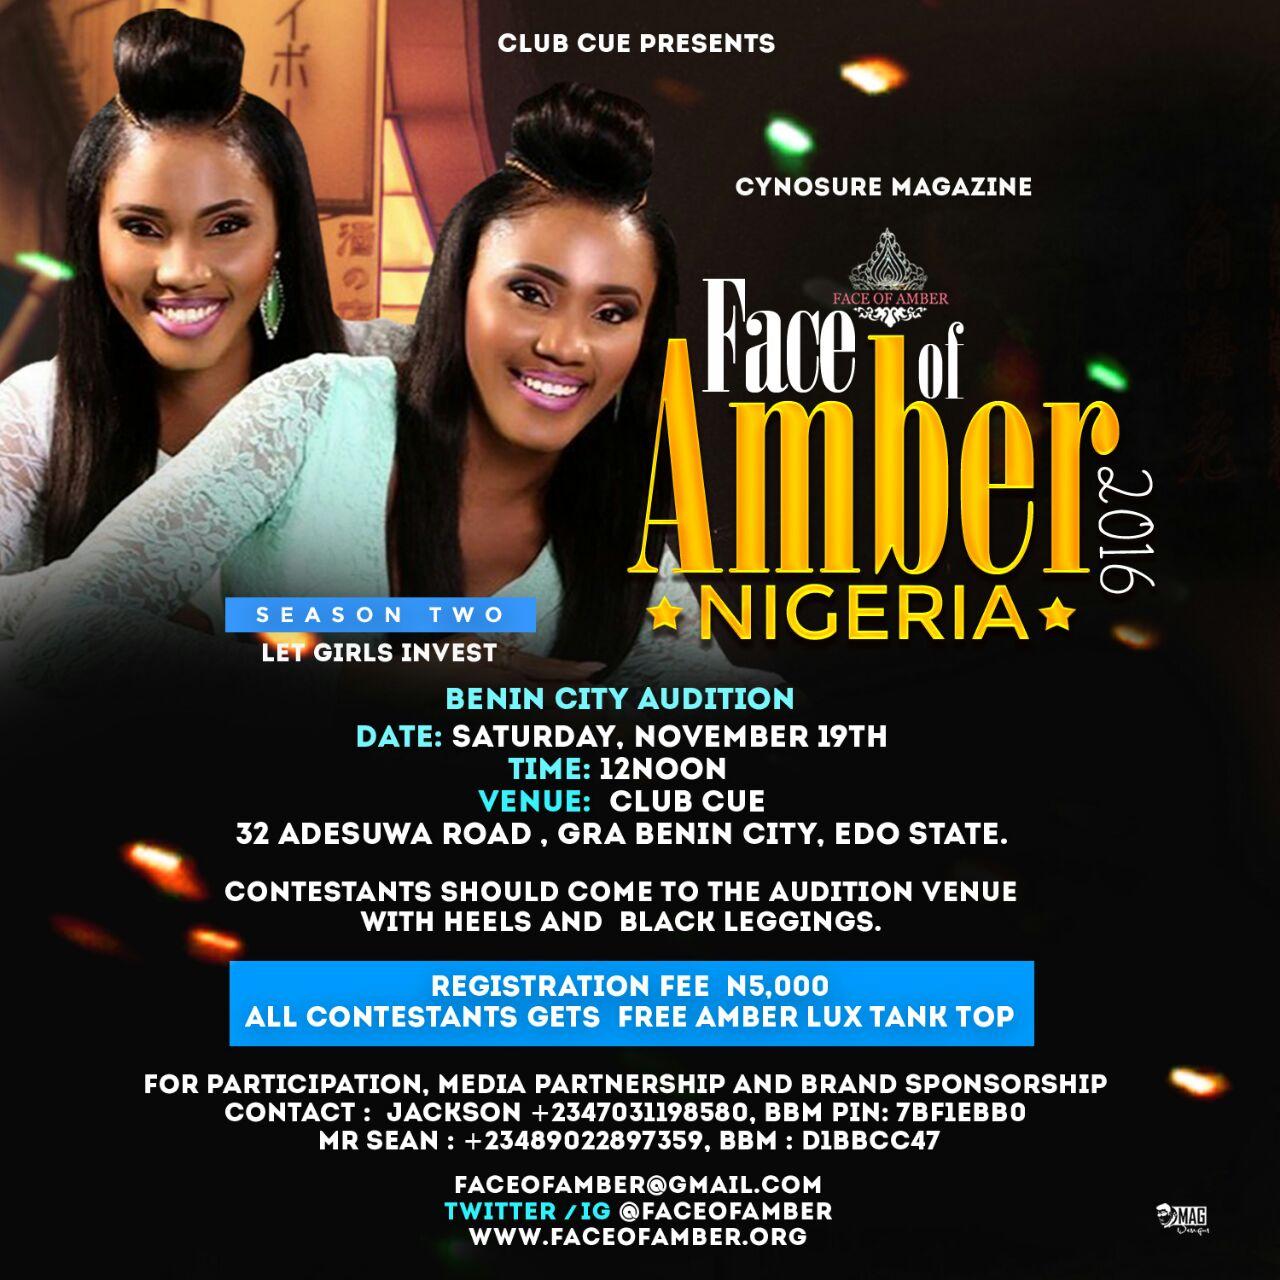 Dating clubs Nigeria